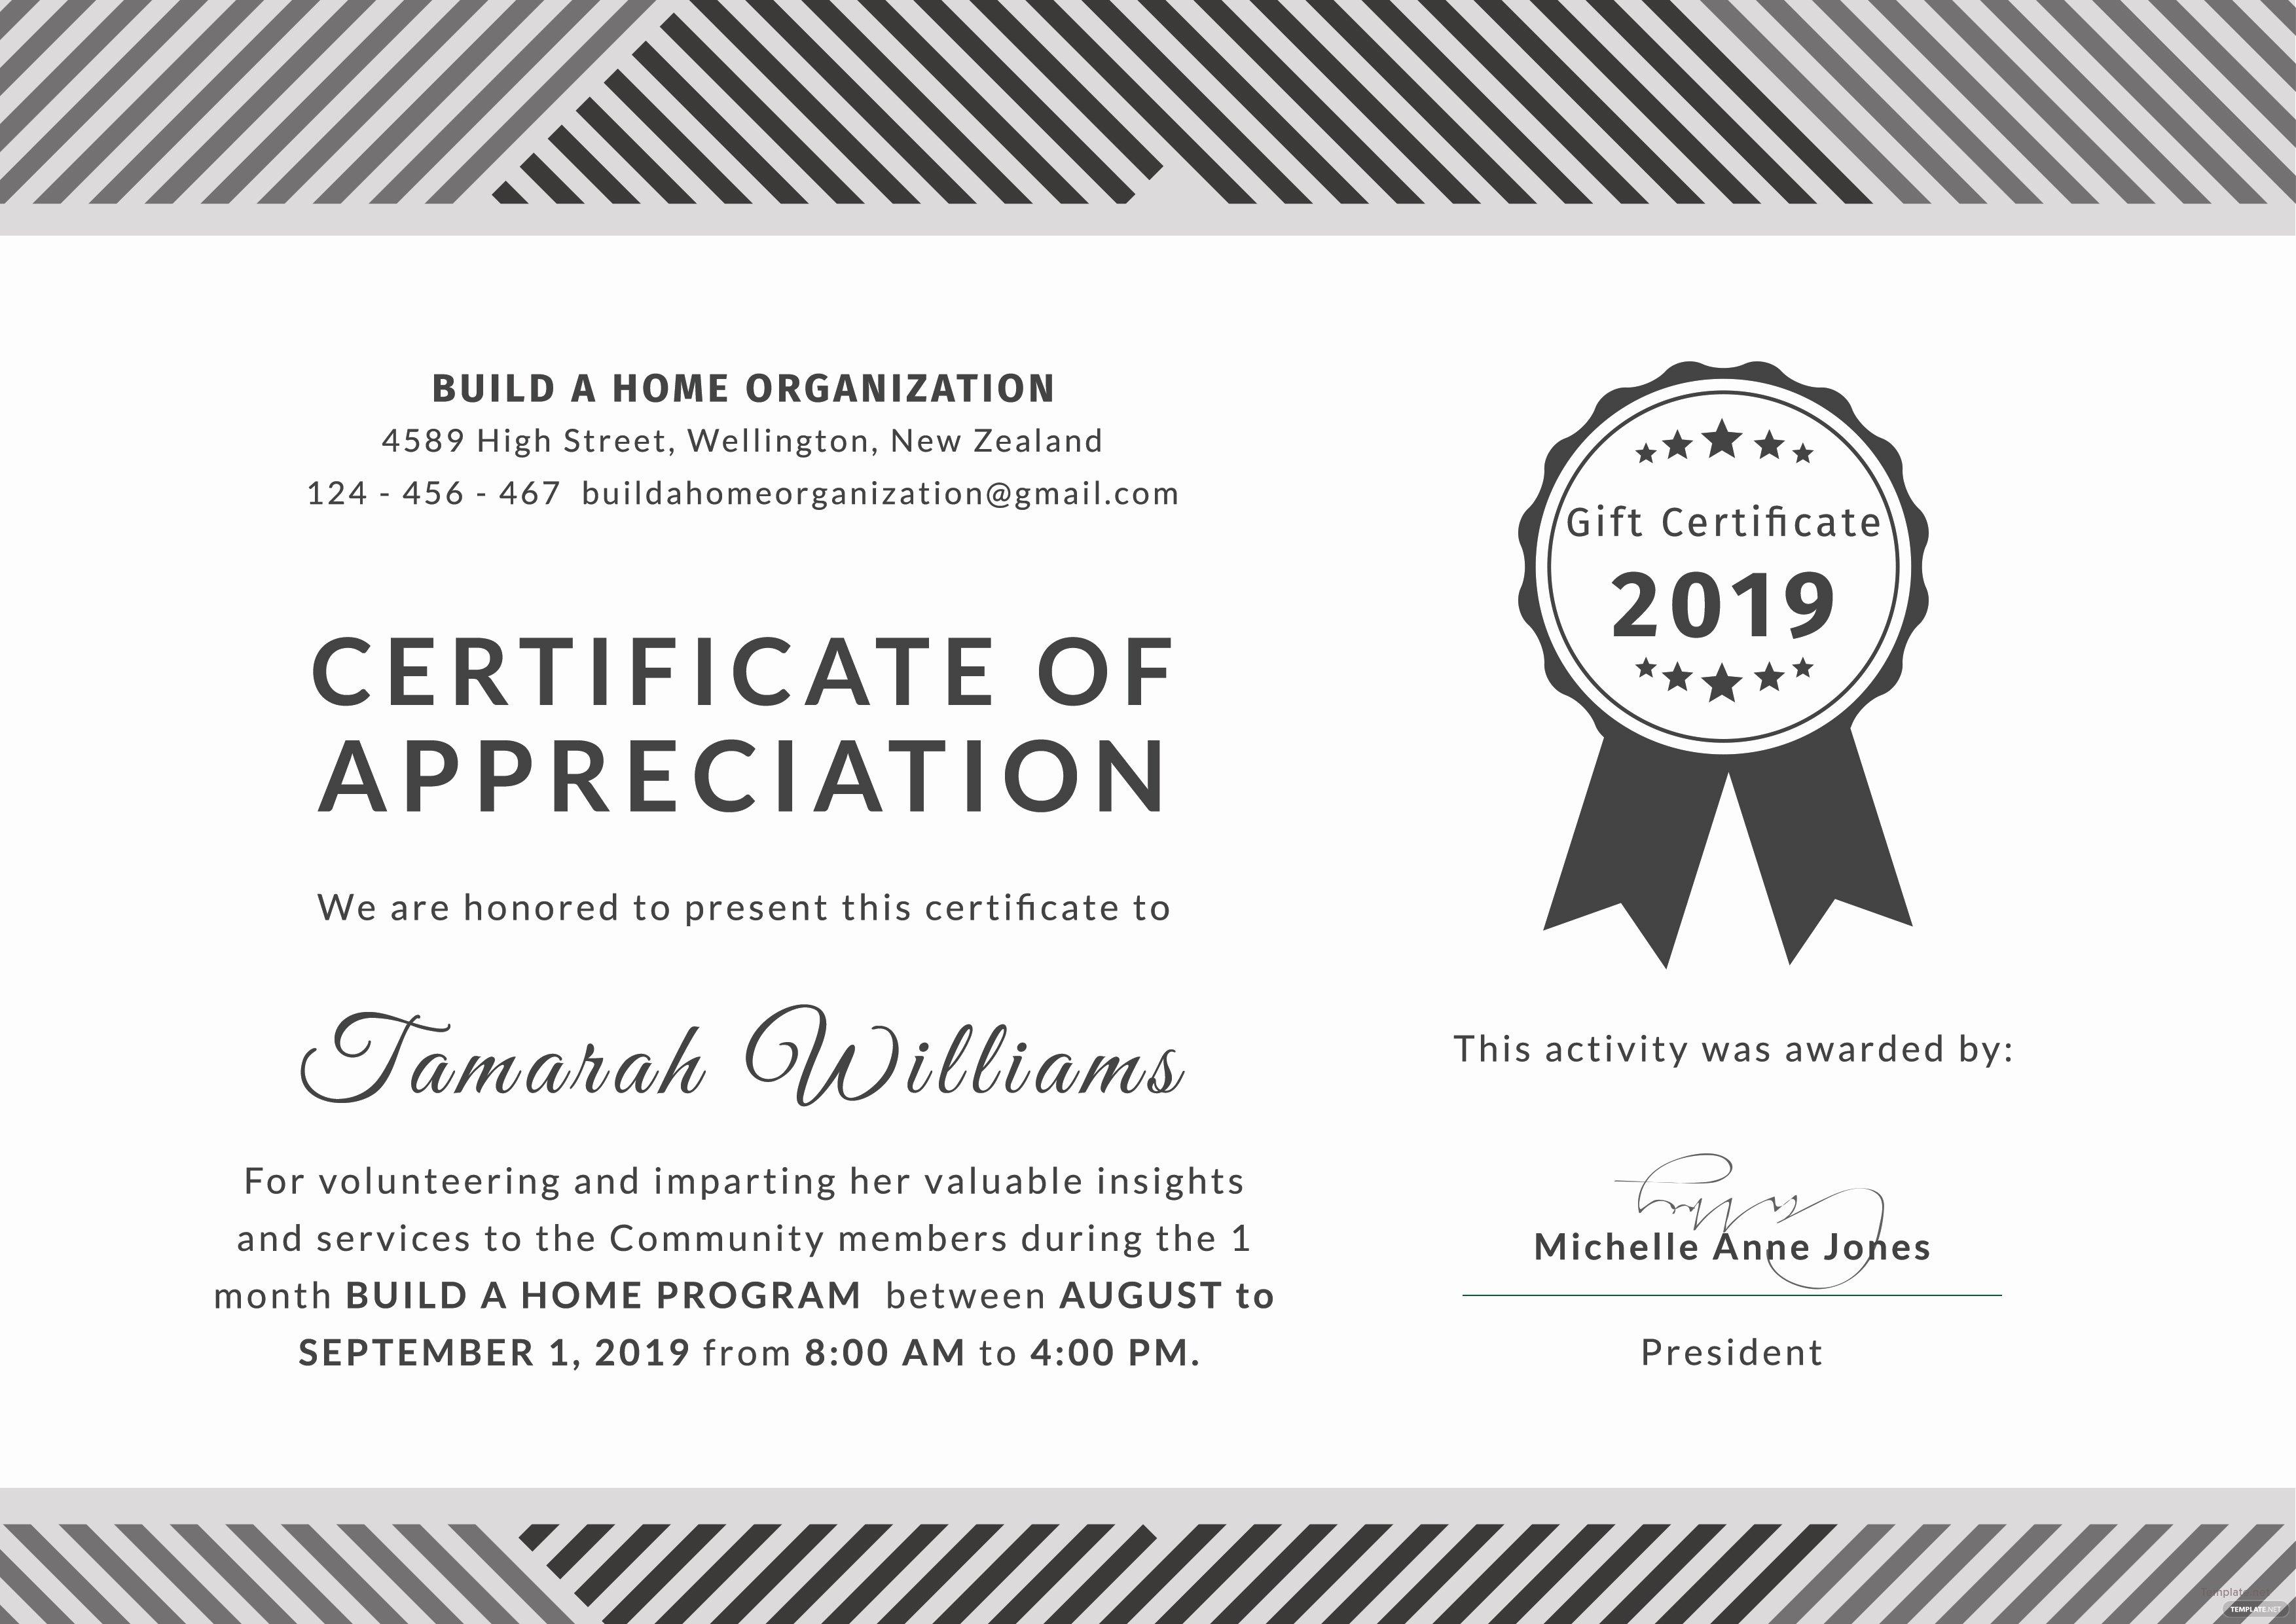 Volunteer Appreciation Certificate Templates Best Of Free Volunteer Certificate Of Appreciation Template In